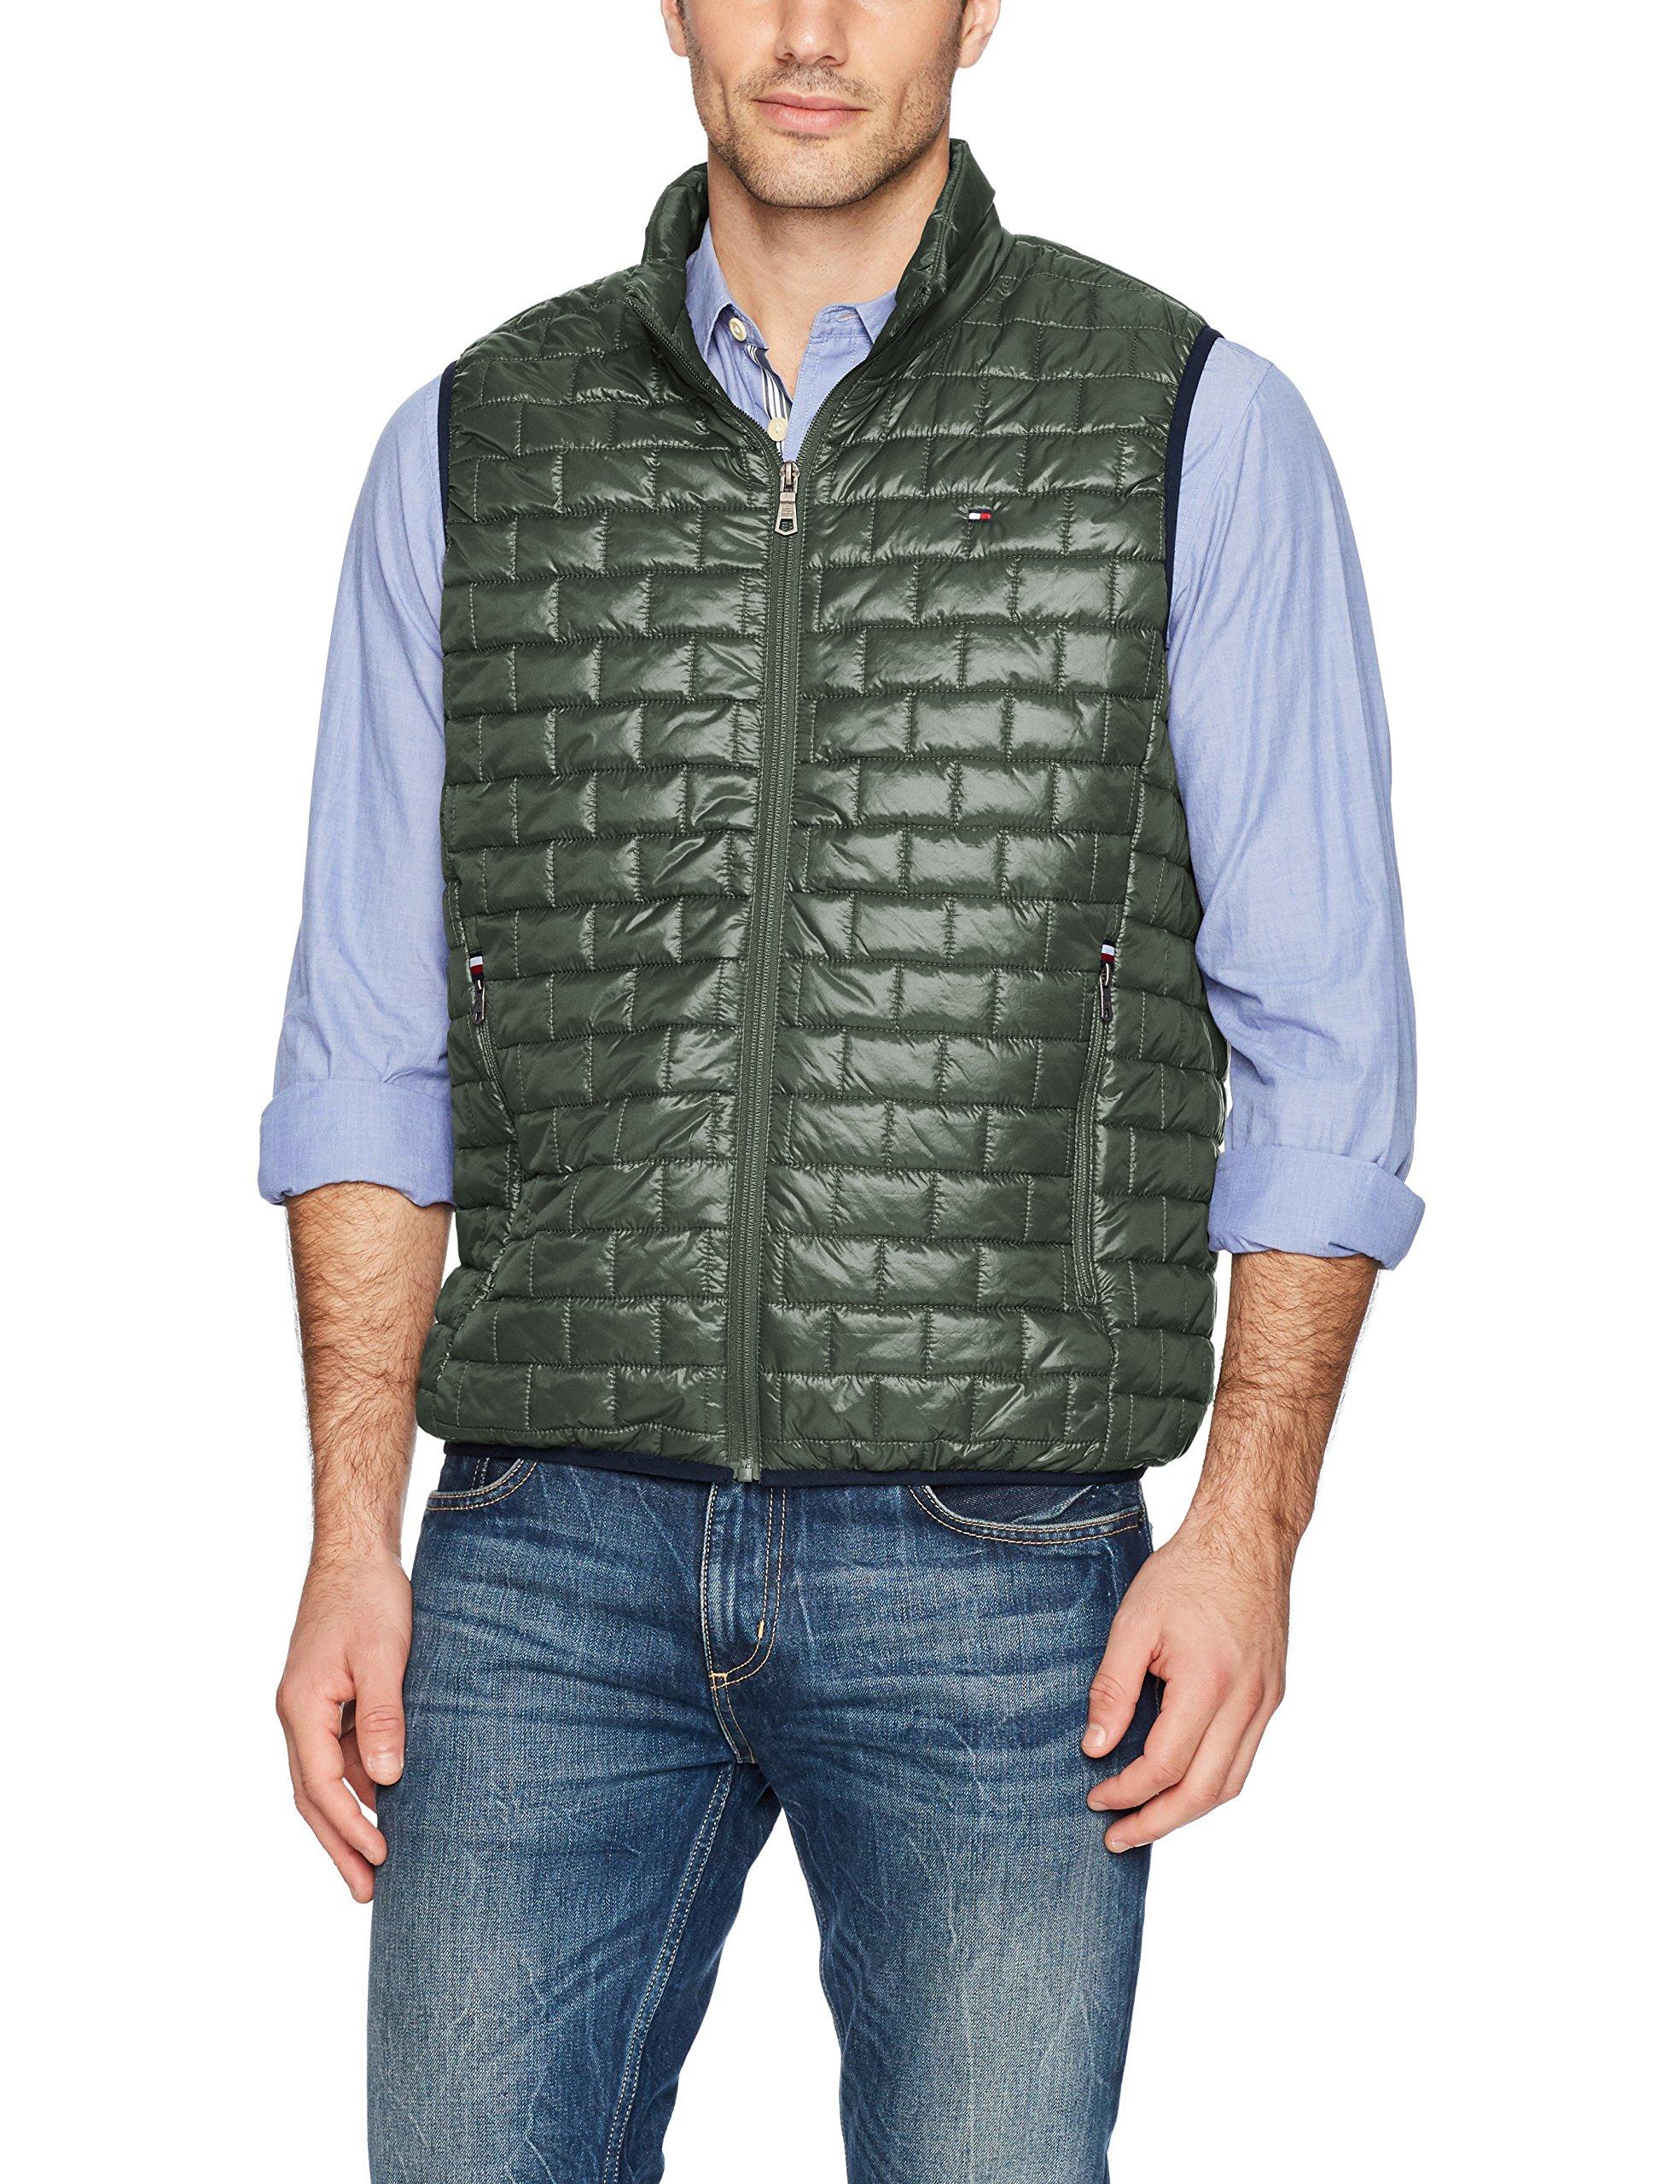 Tommy Hilfiger Men's Box Quilted Lightweight Ultra Loft Vest, green, X-Large by Tommy Hilfiger